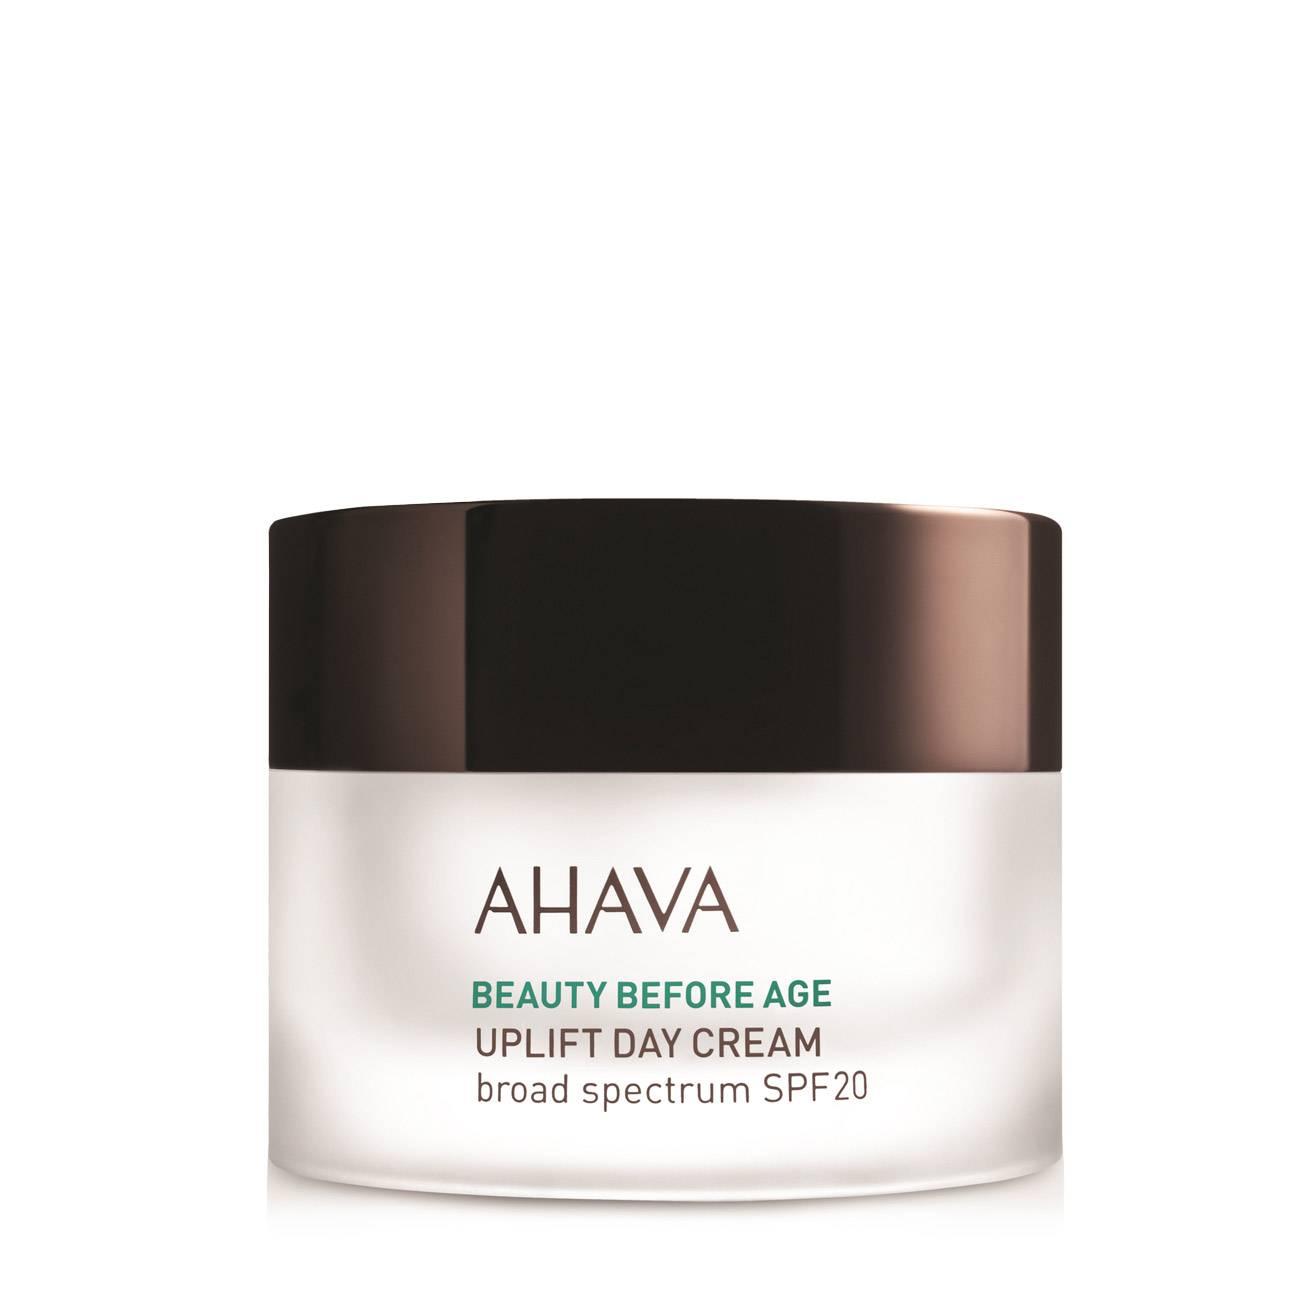 Beauty Before Age Uplift Day Cream Spf20 50 Ml Ahava imagine 2021 bestvalue.eu